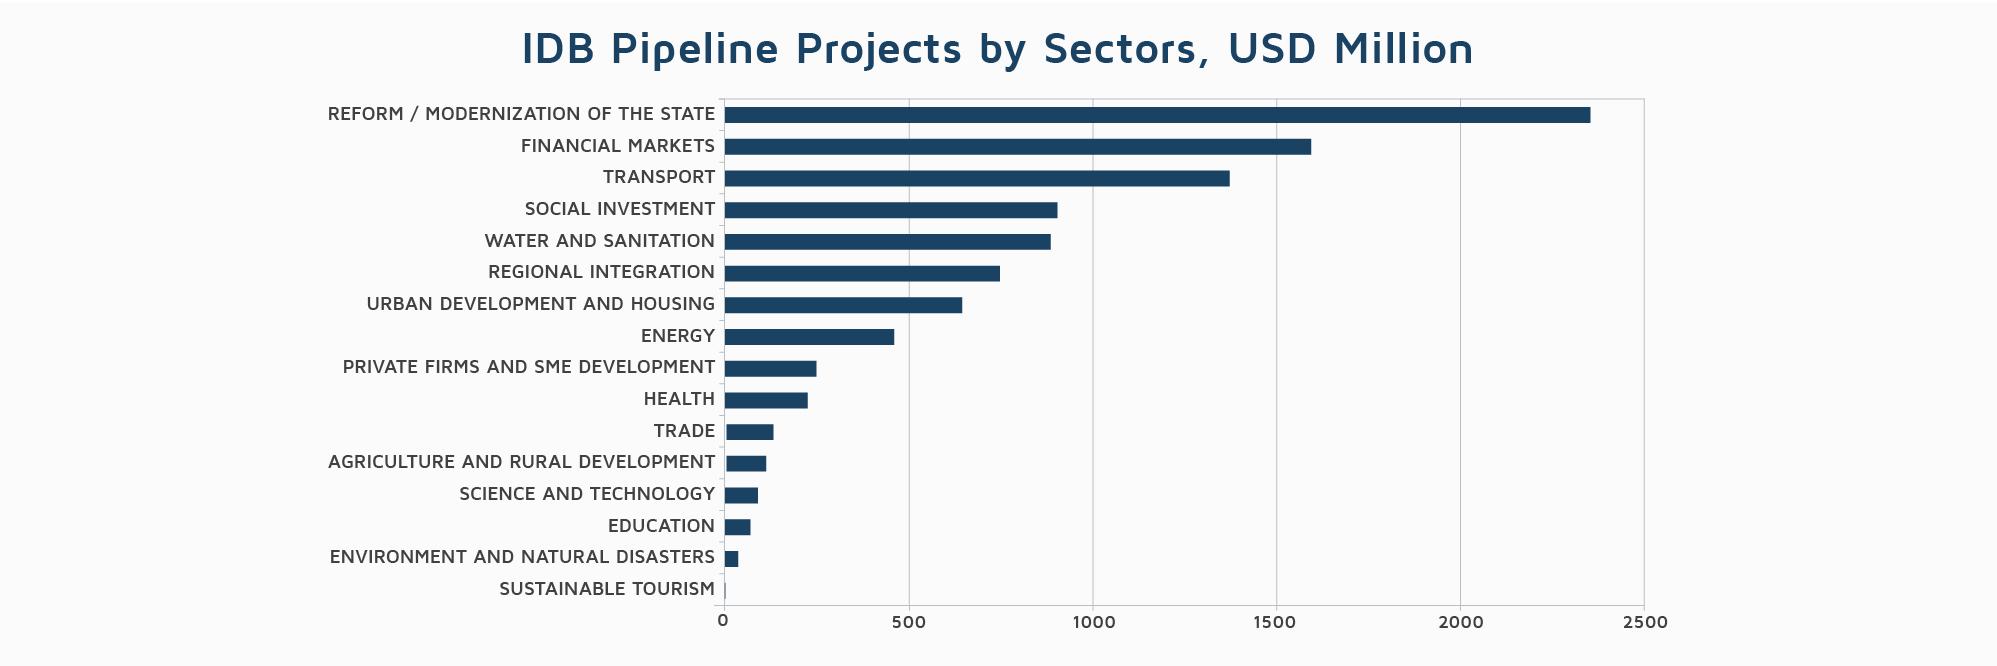 Inter-American Development Bank Funding Pipeline DevelopmentAid